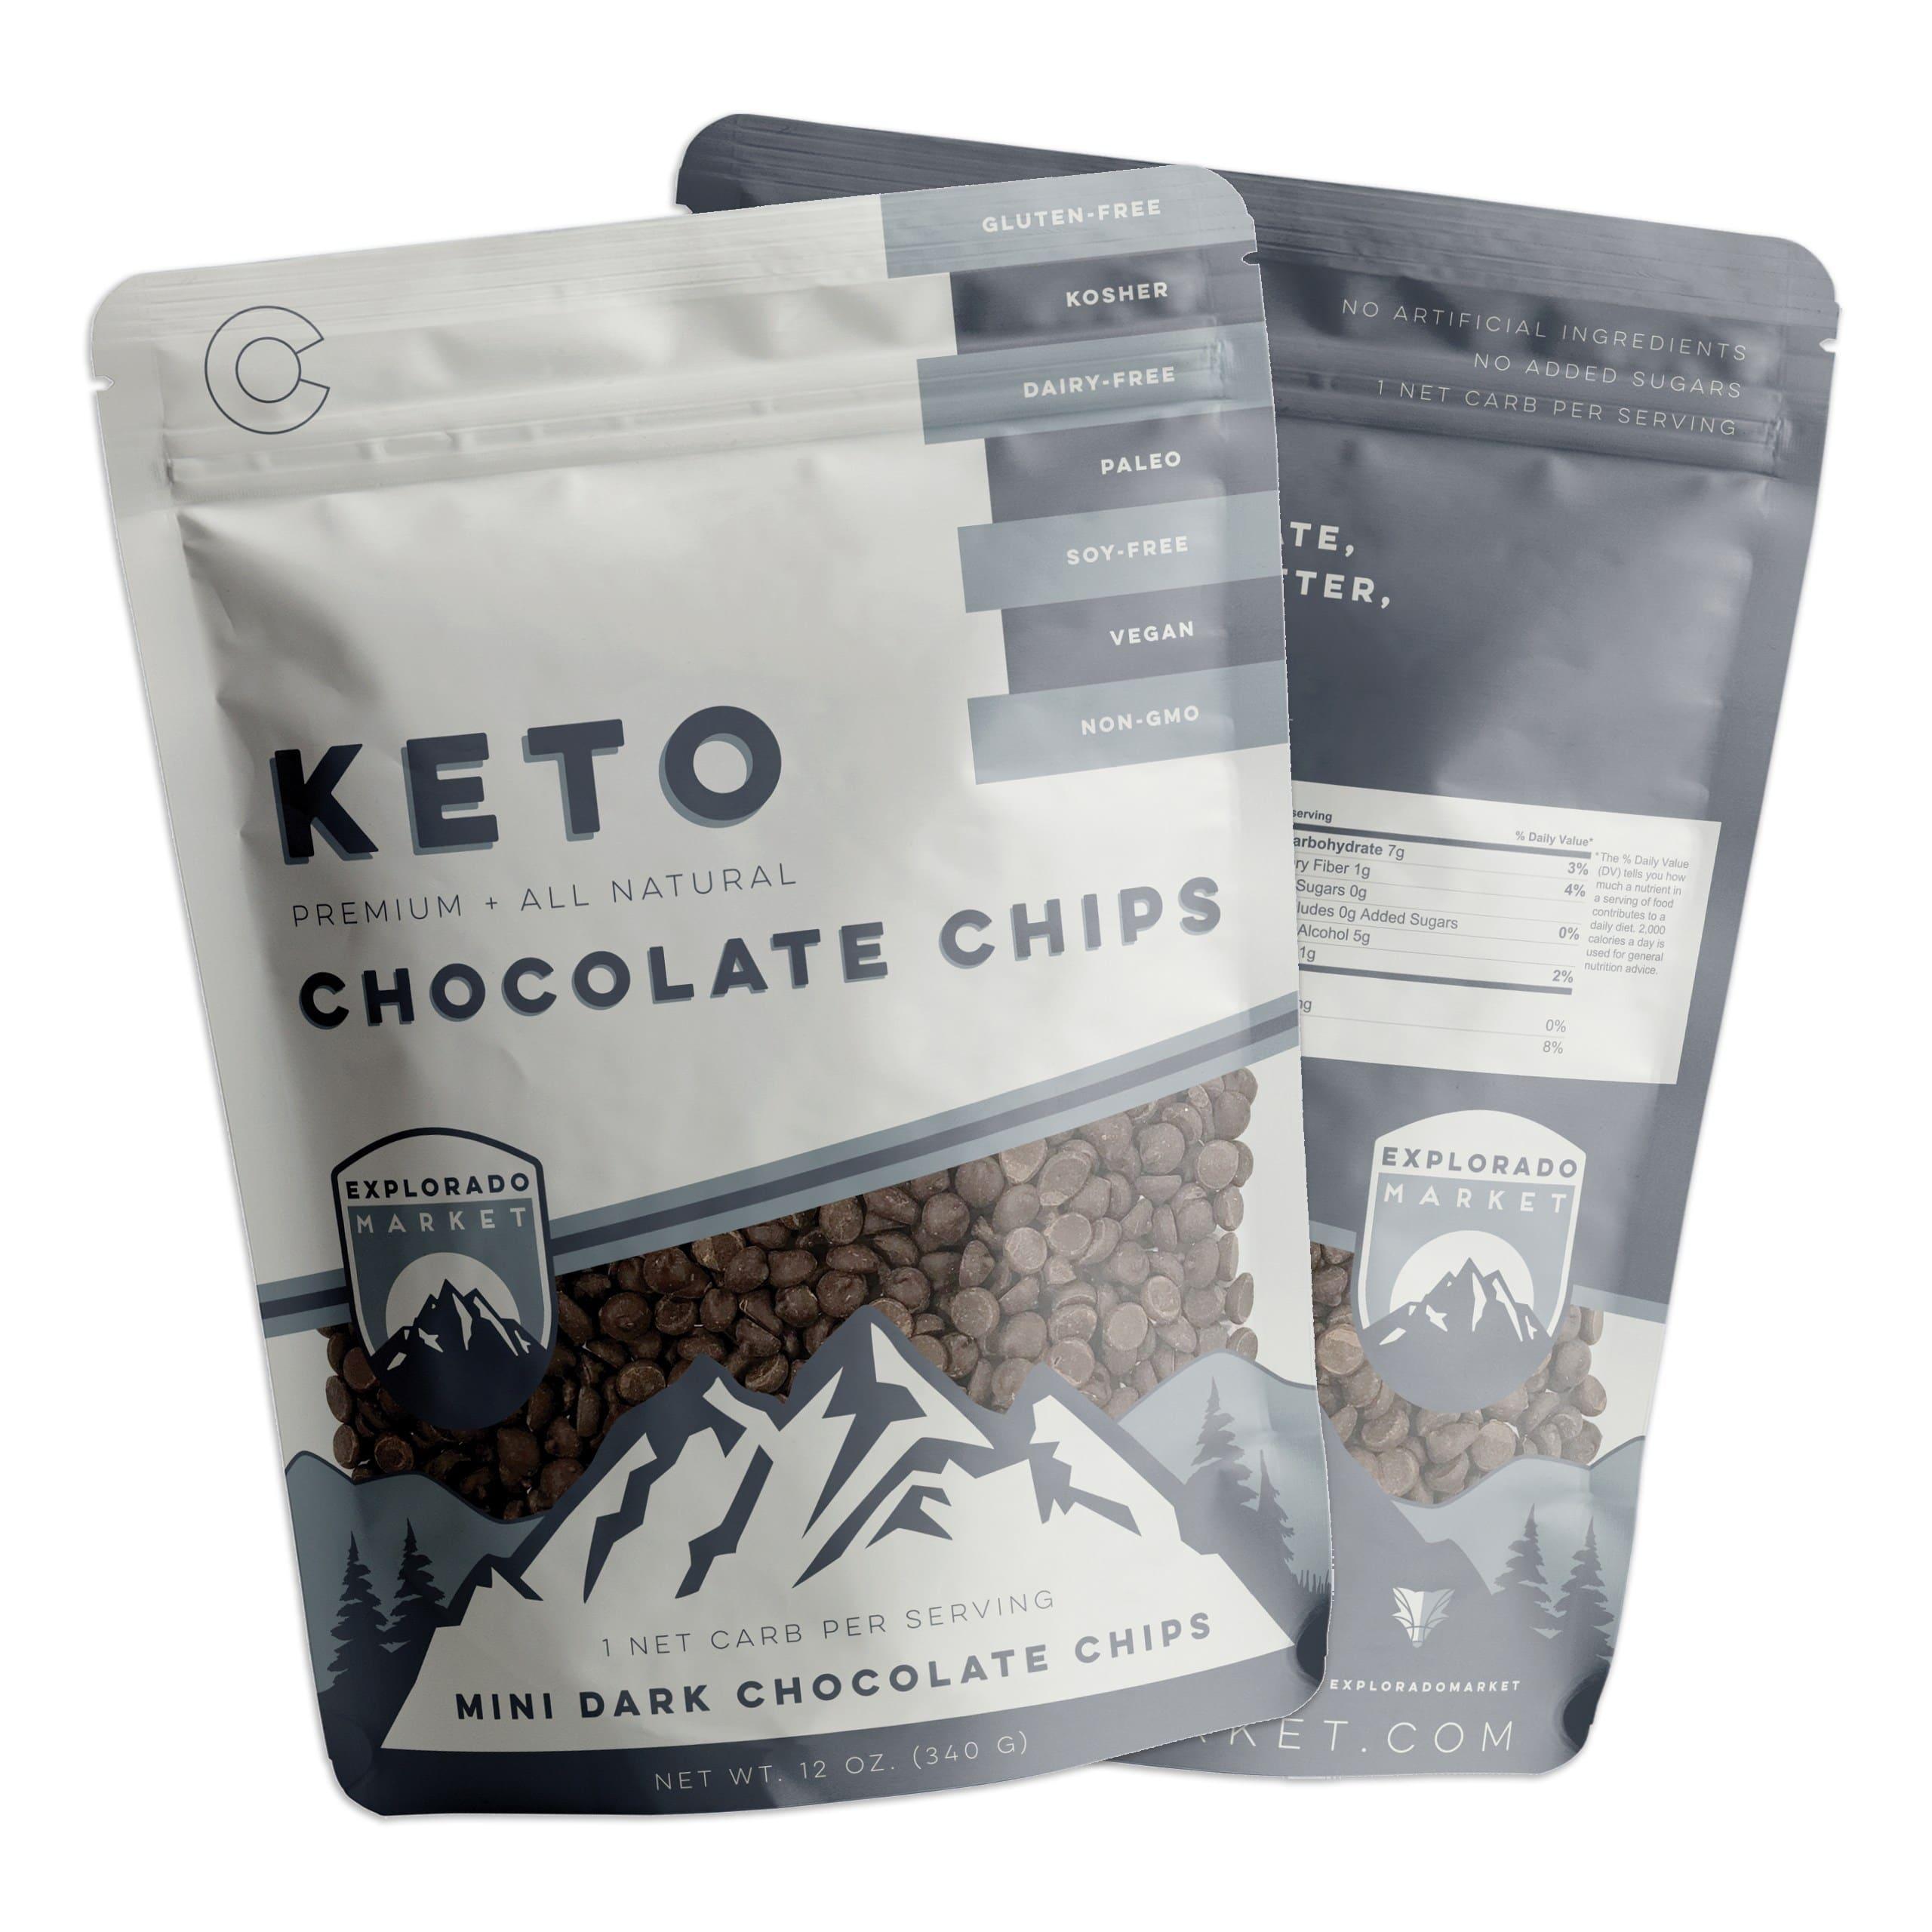 Explorado Market Announces Launch of Keto Mini Dark Chocolate Chips